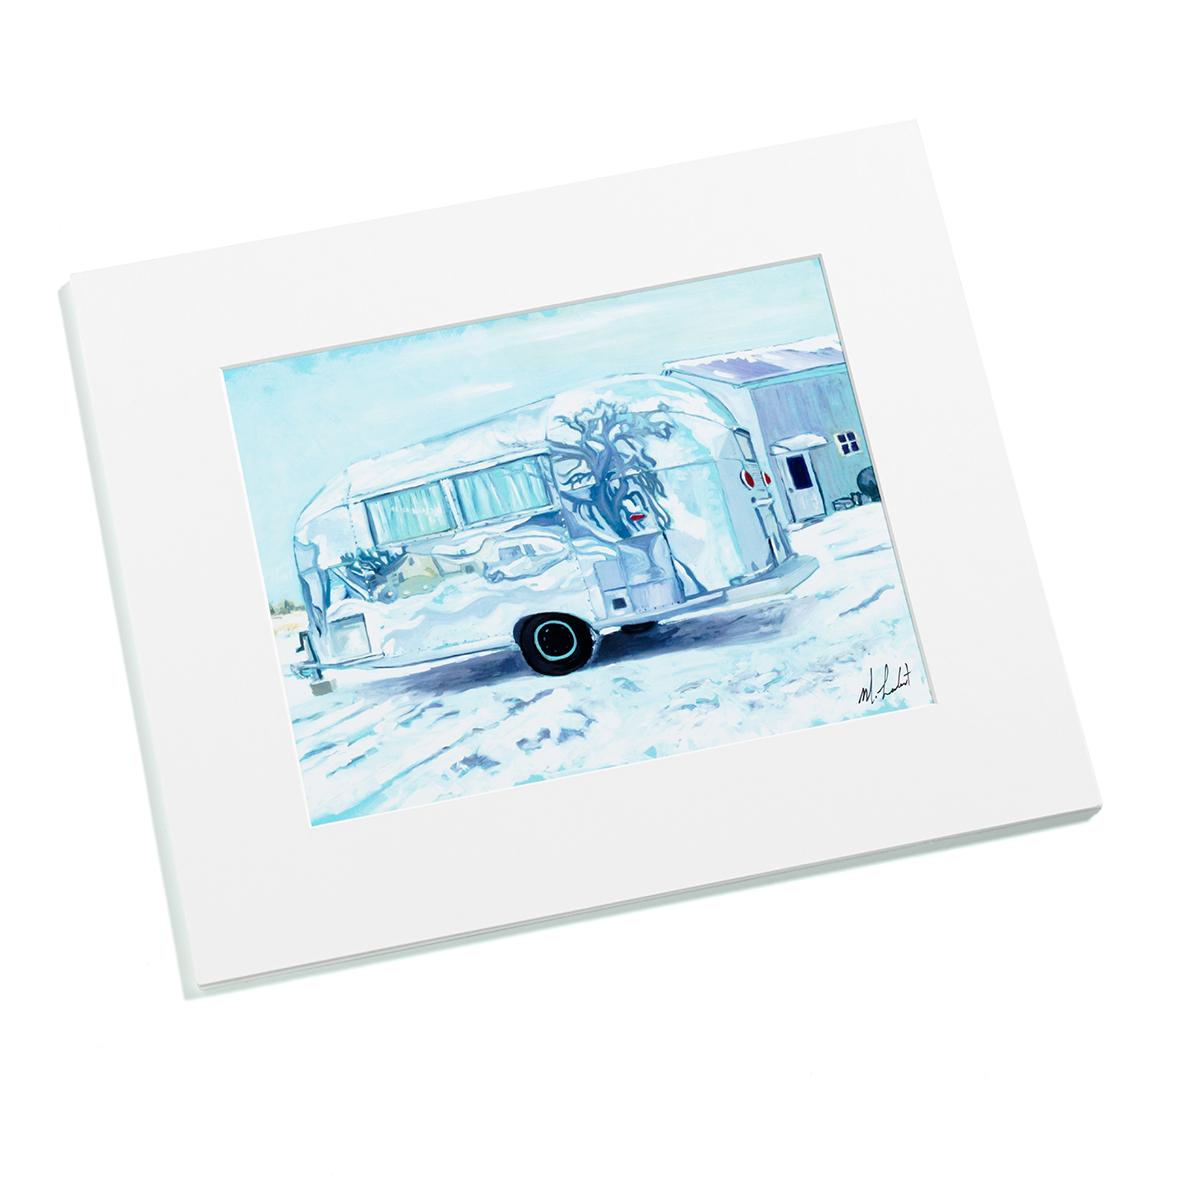 AIRMKT eCom PN 76072W-19 Bambi Winter Art Print Snow White Matte_50358 WEB